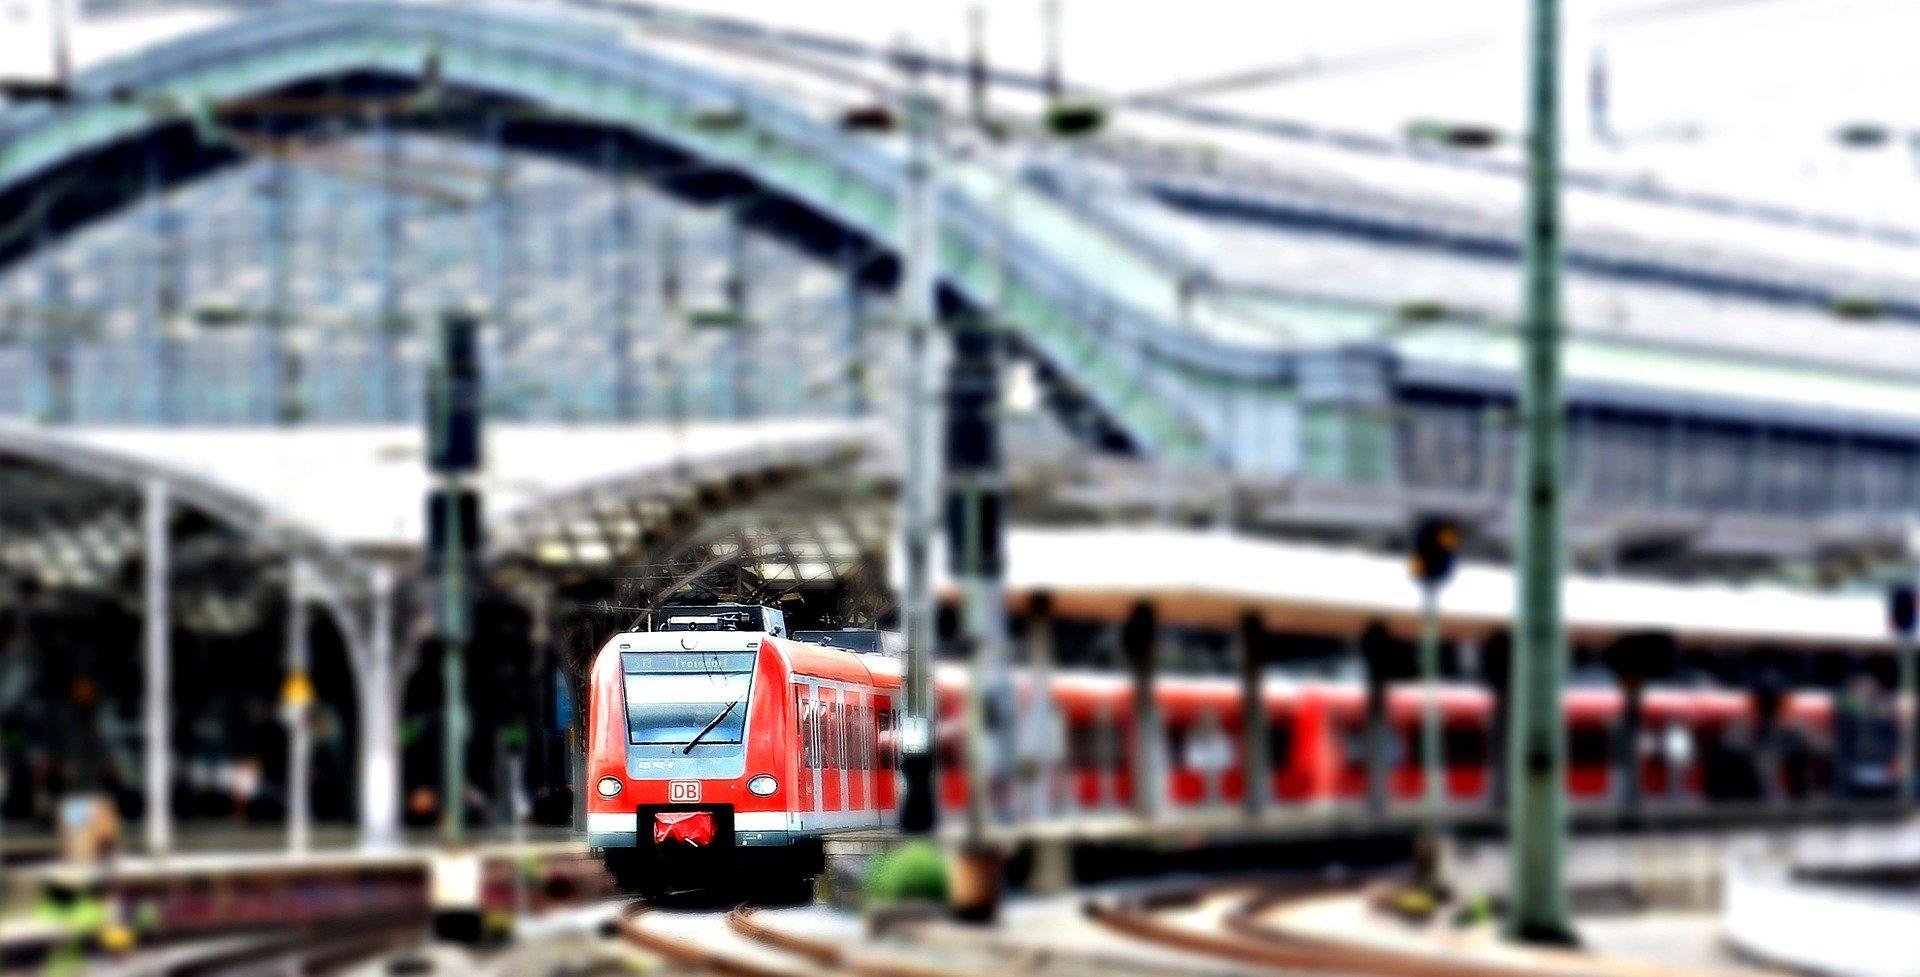 Cancelled trains compensation